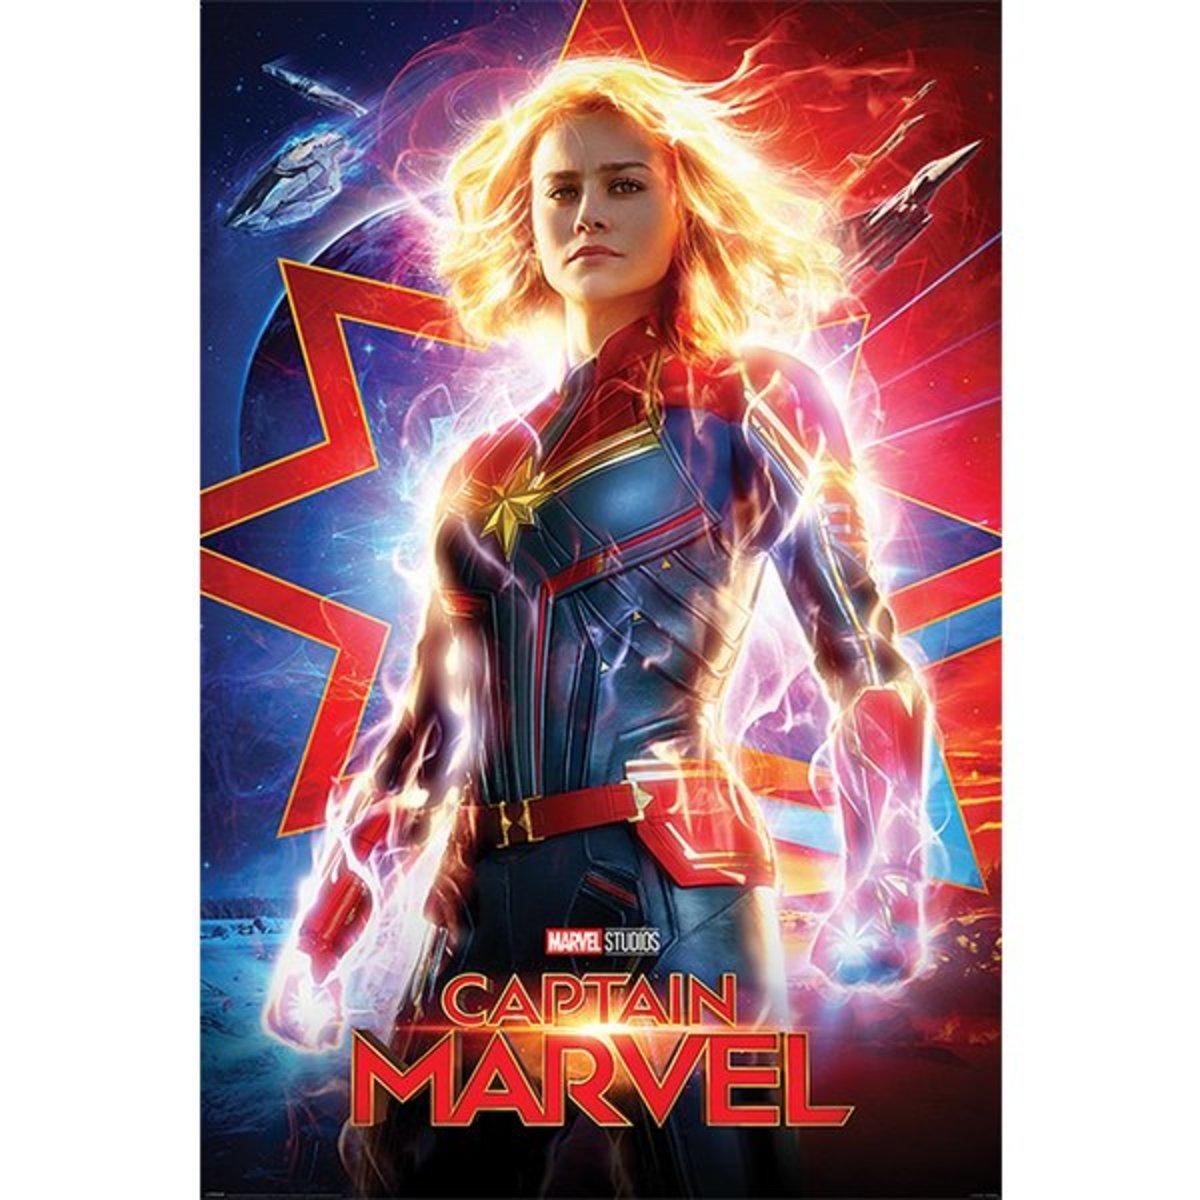 'Captain Marvel' (2019) - Film Review